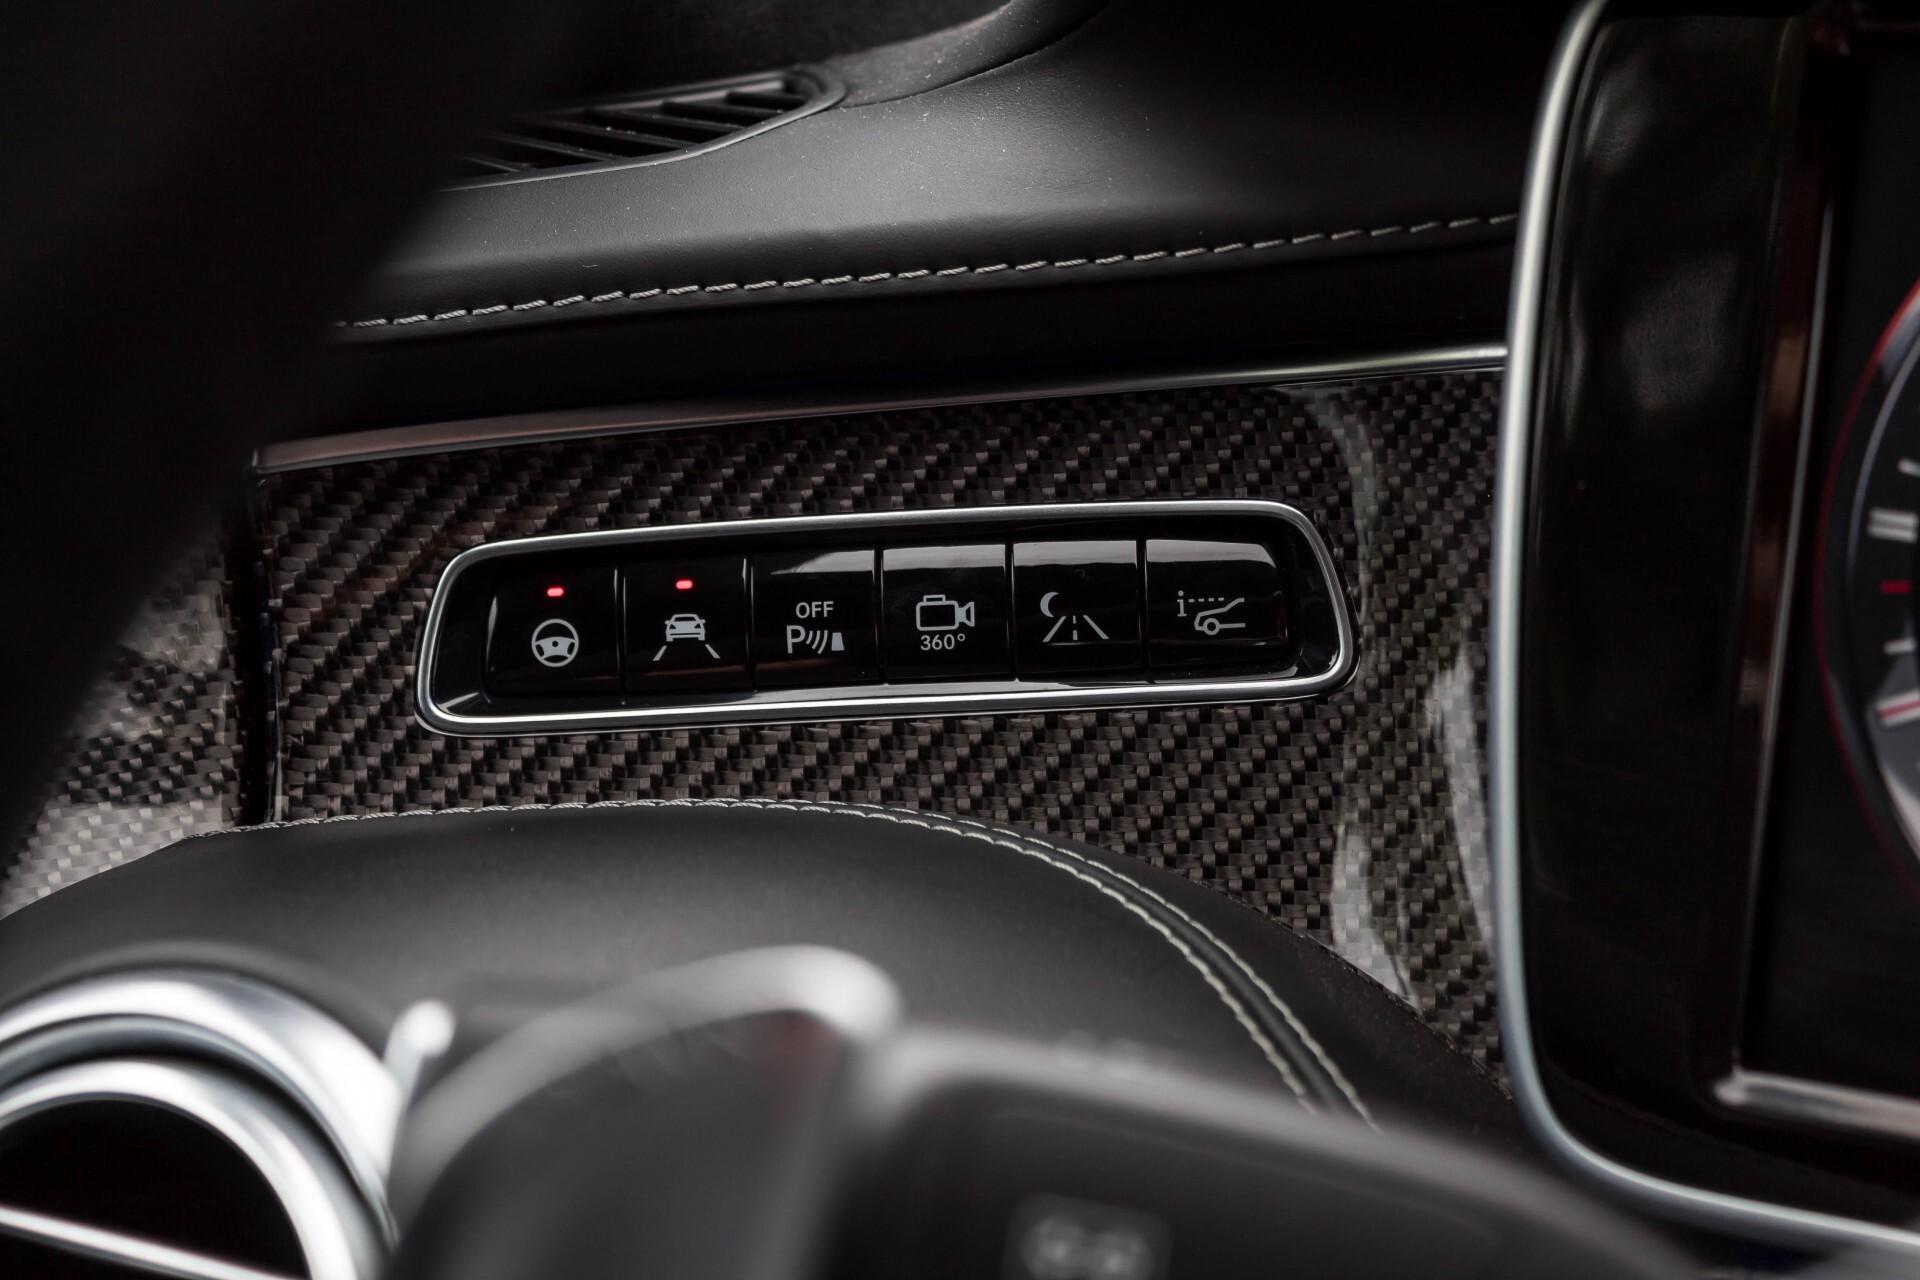 Mercedes-Benz S-Klasse Cabrio 63 AMG 4-M Ceramic/Designo/Carbon/Burmester High End Aut Foto 24